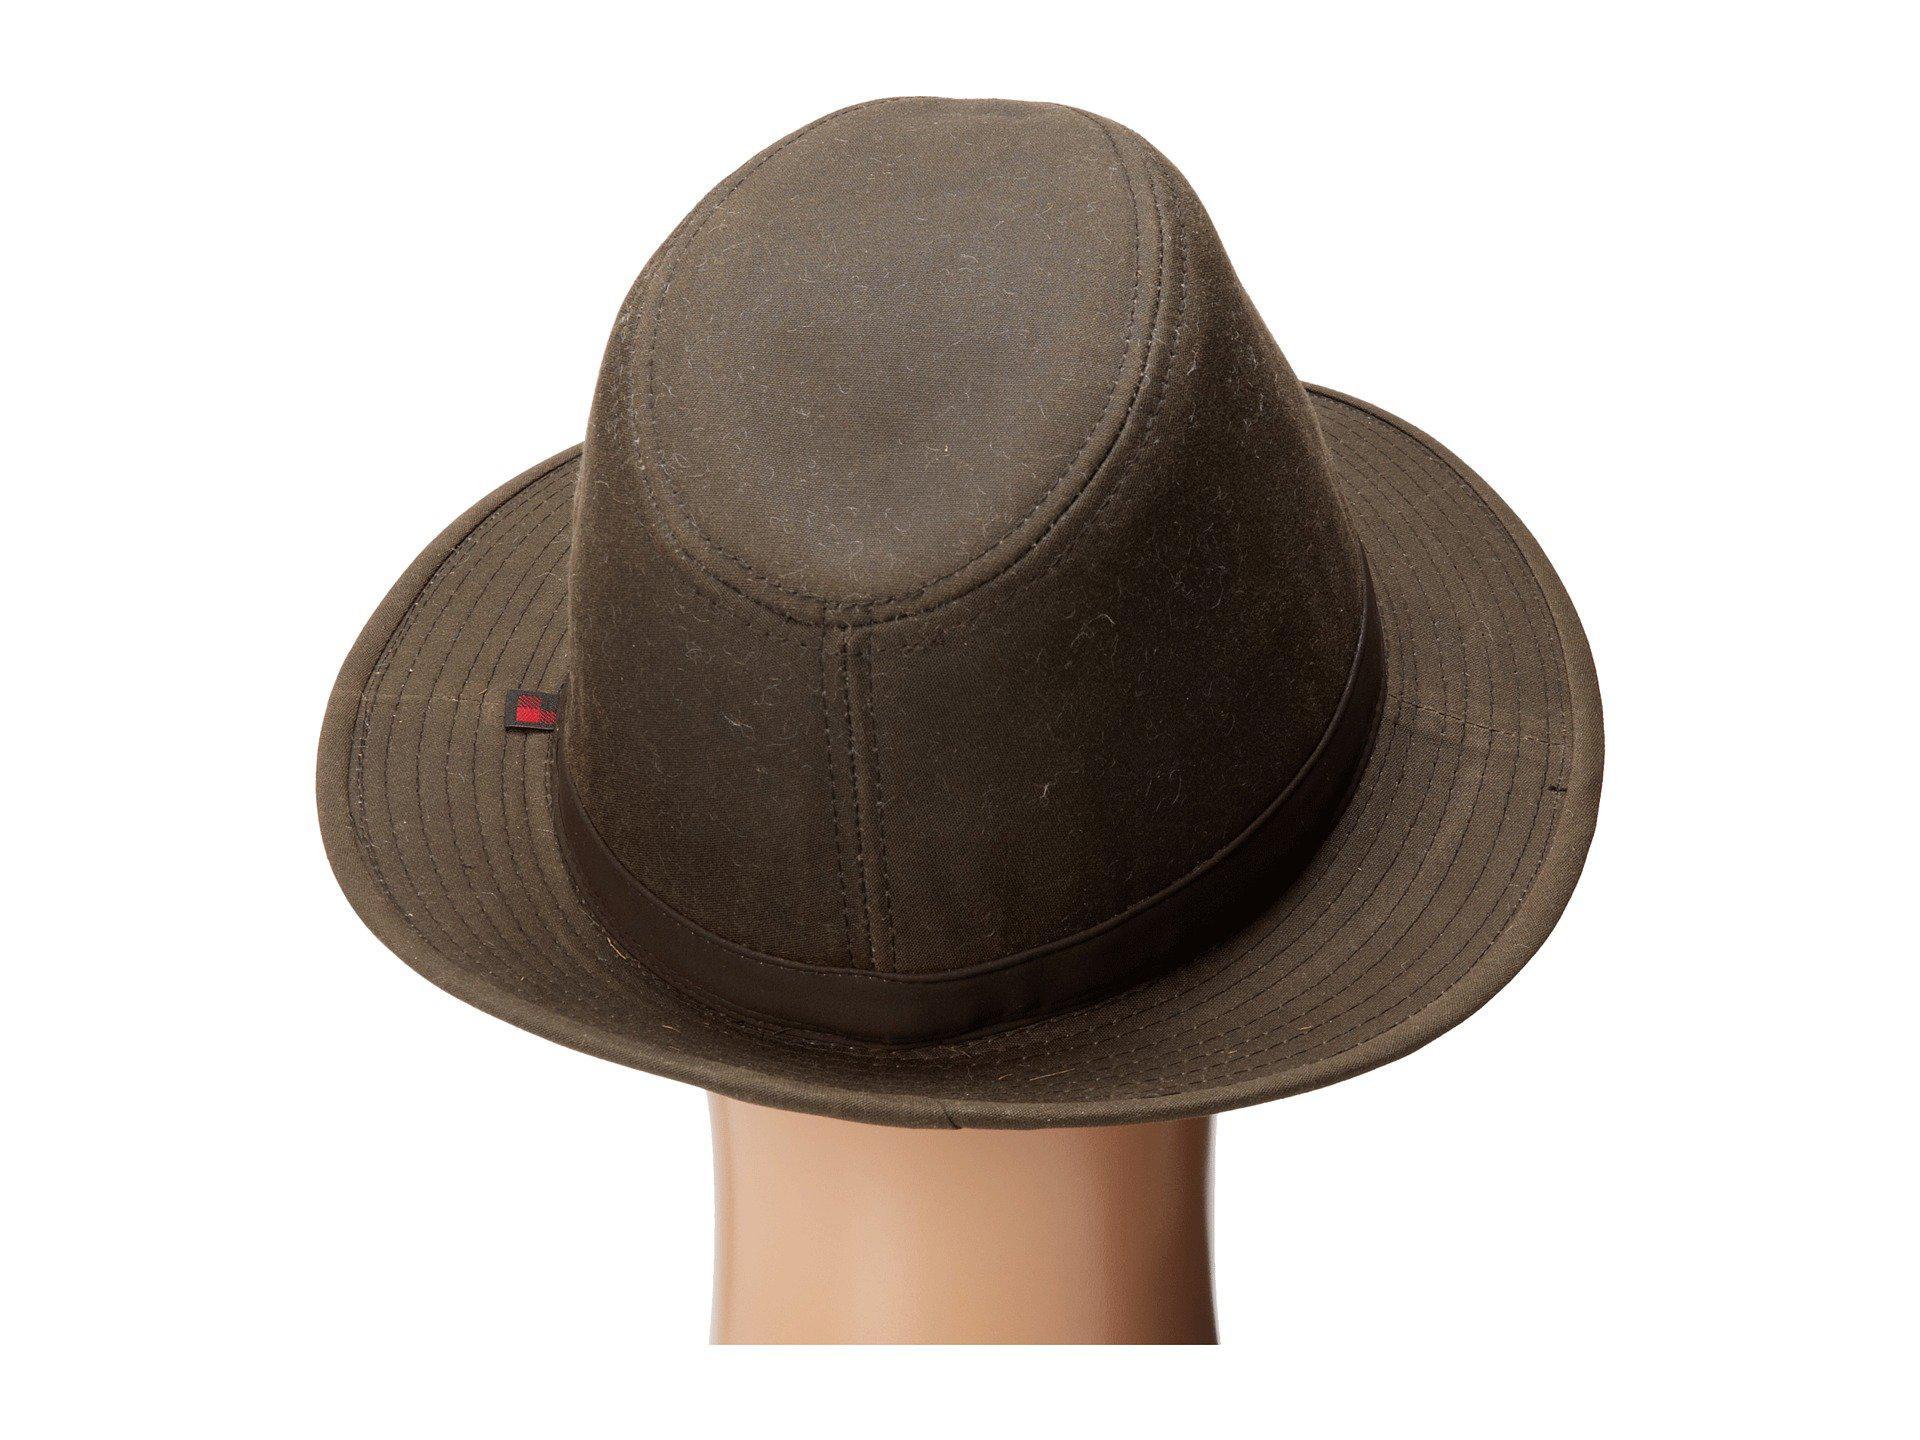 fbae959c229e9 Lyst - Woolrich Oil Cloth Safari W  Plaid Lining (brown) Caps in ...